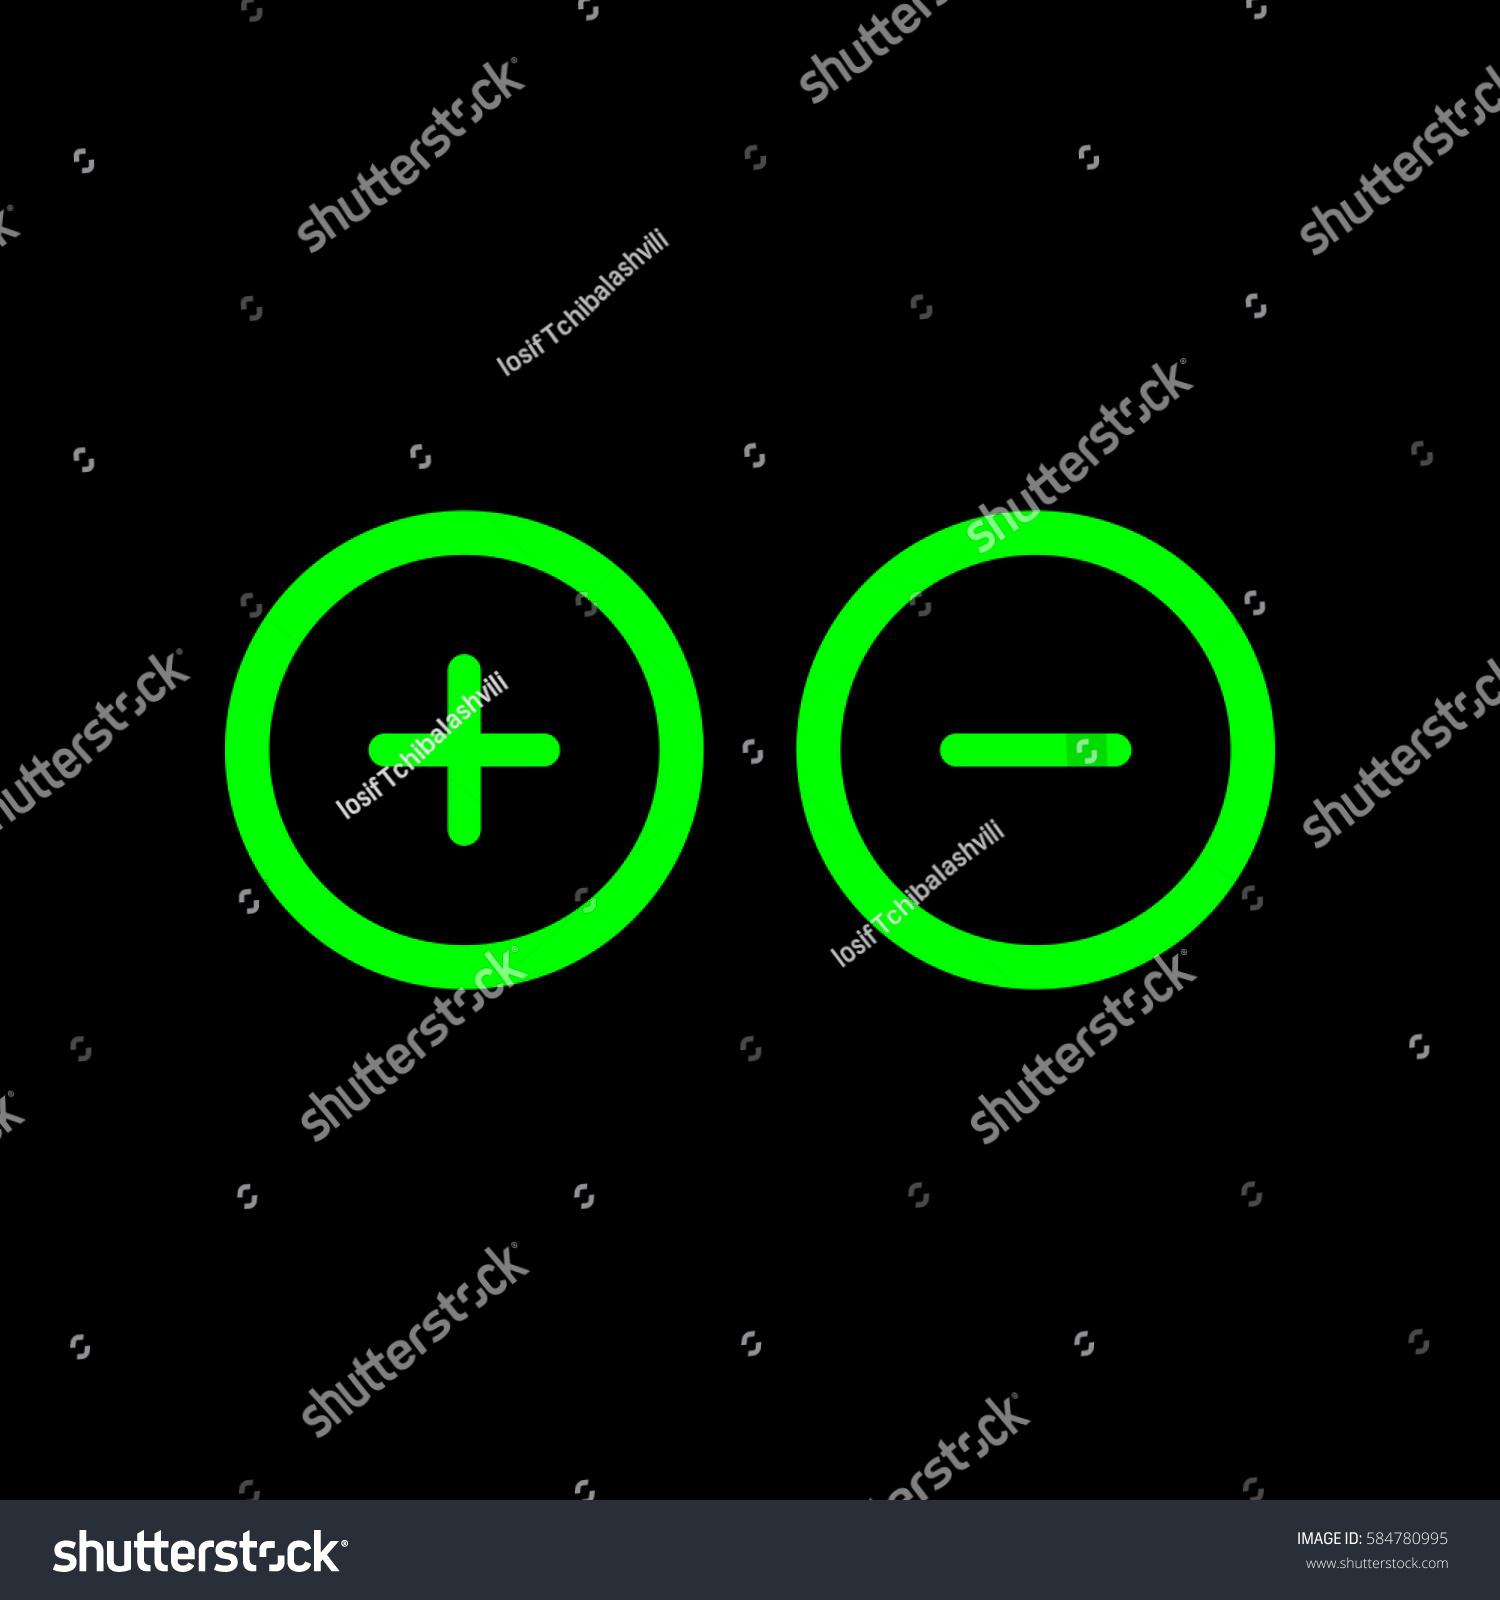 Similar Images Stock Photos Vectors Of Plus Minus Sign Circle